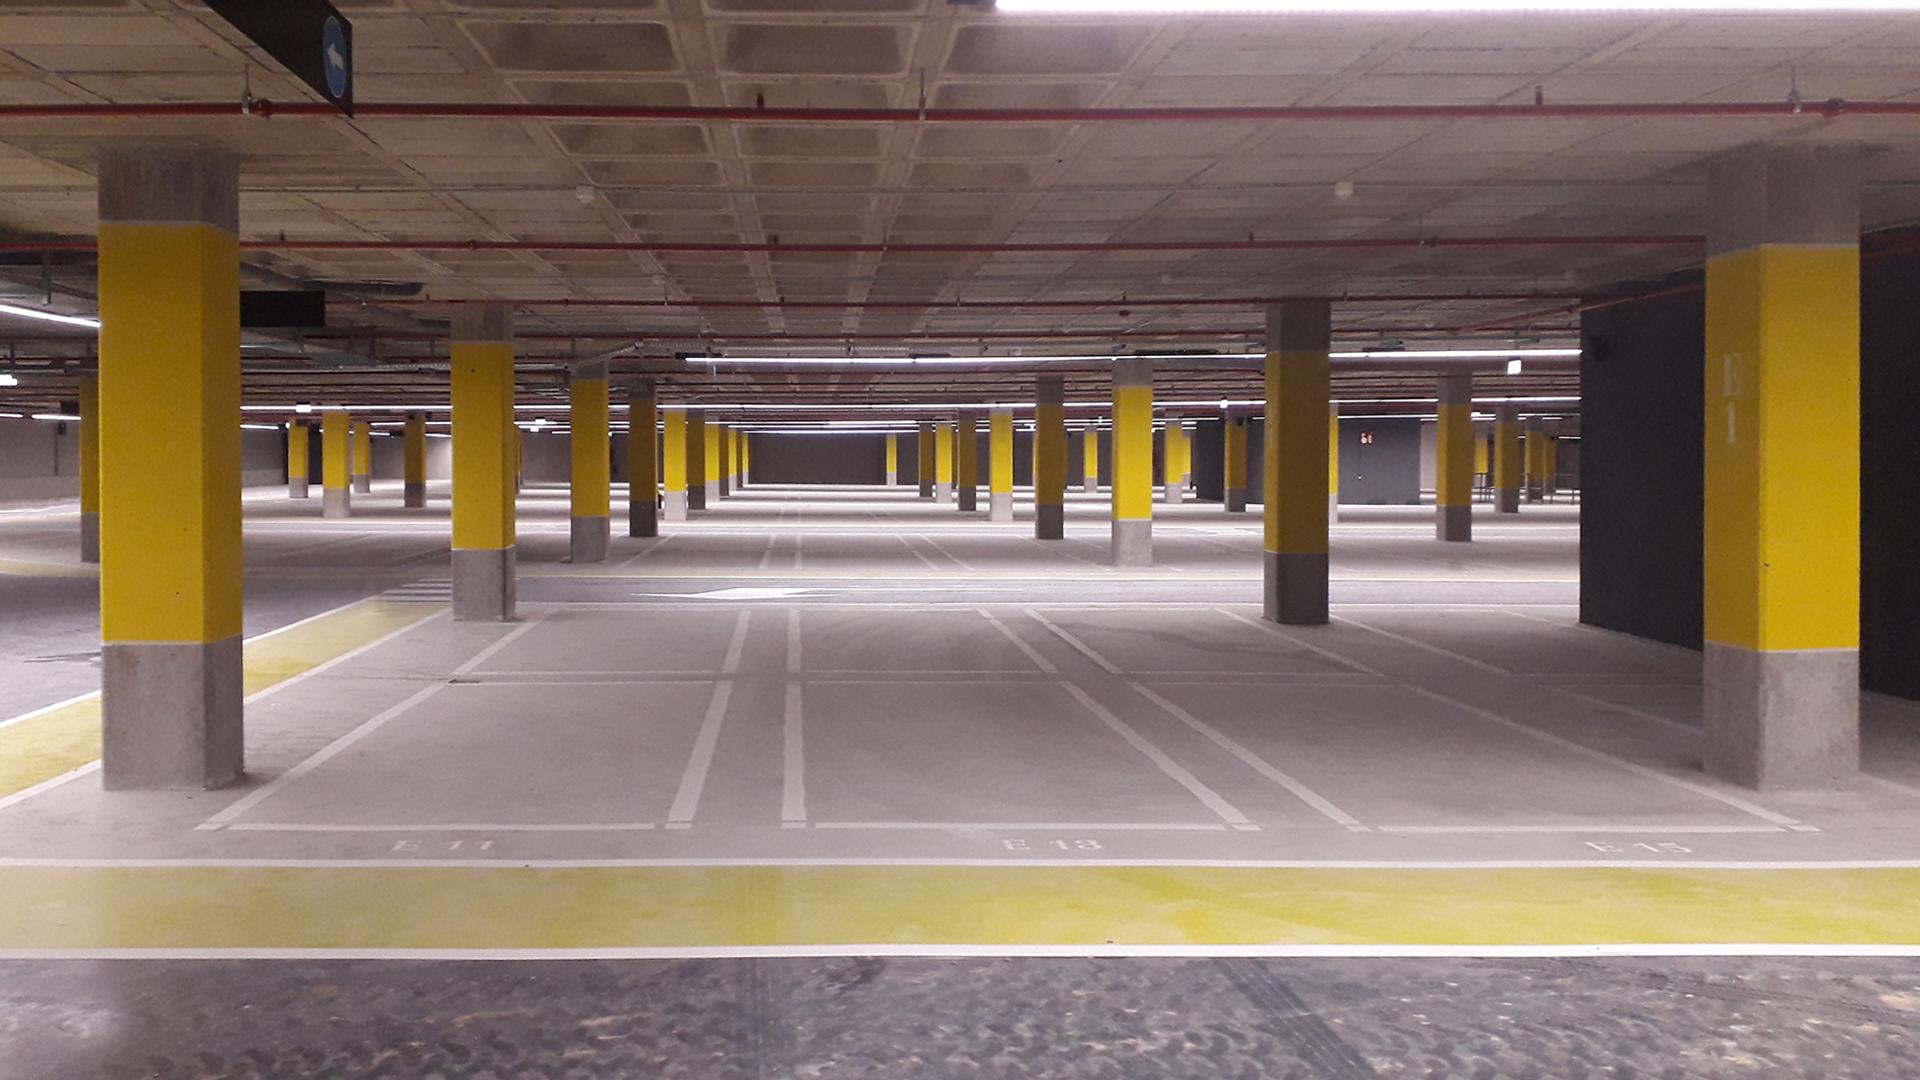 Inaugurada la fase 1 del parking de Garbera en Donostia-San Sebastián